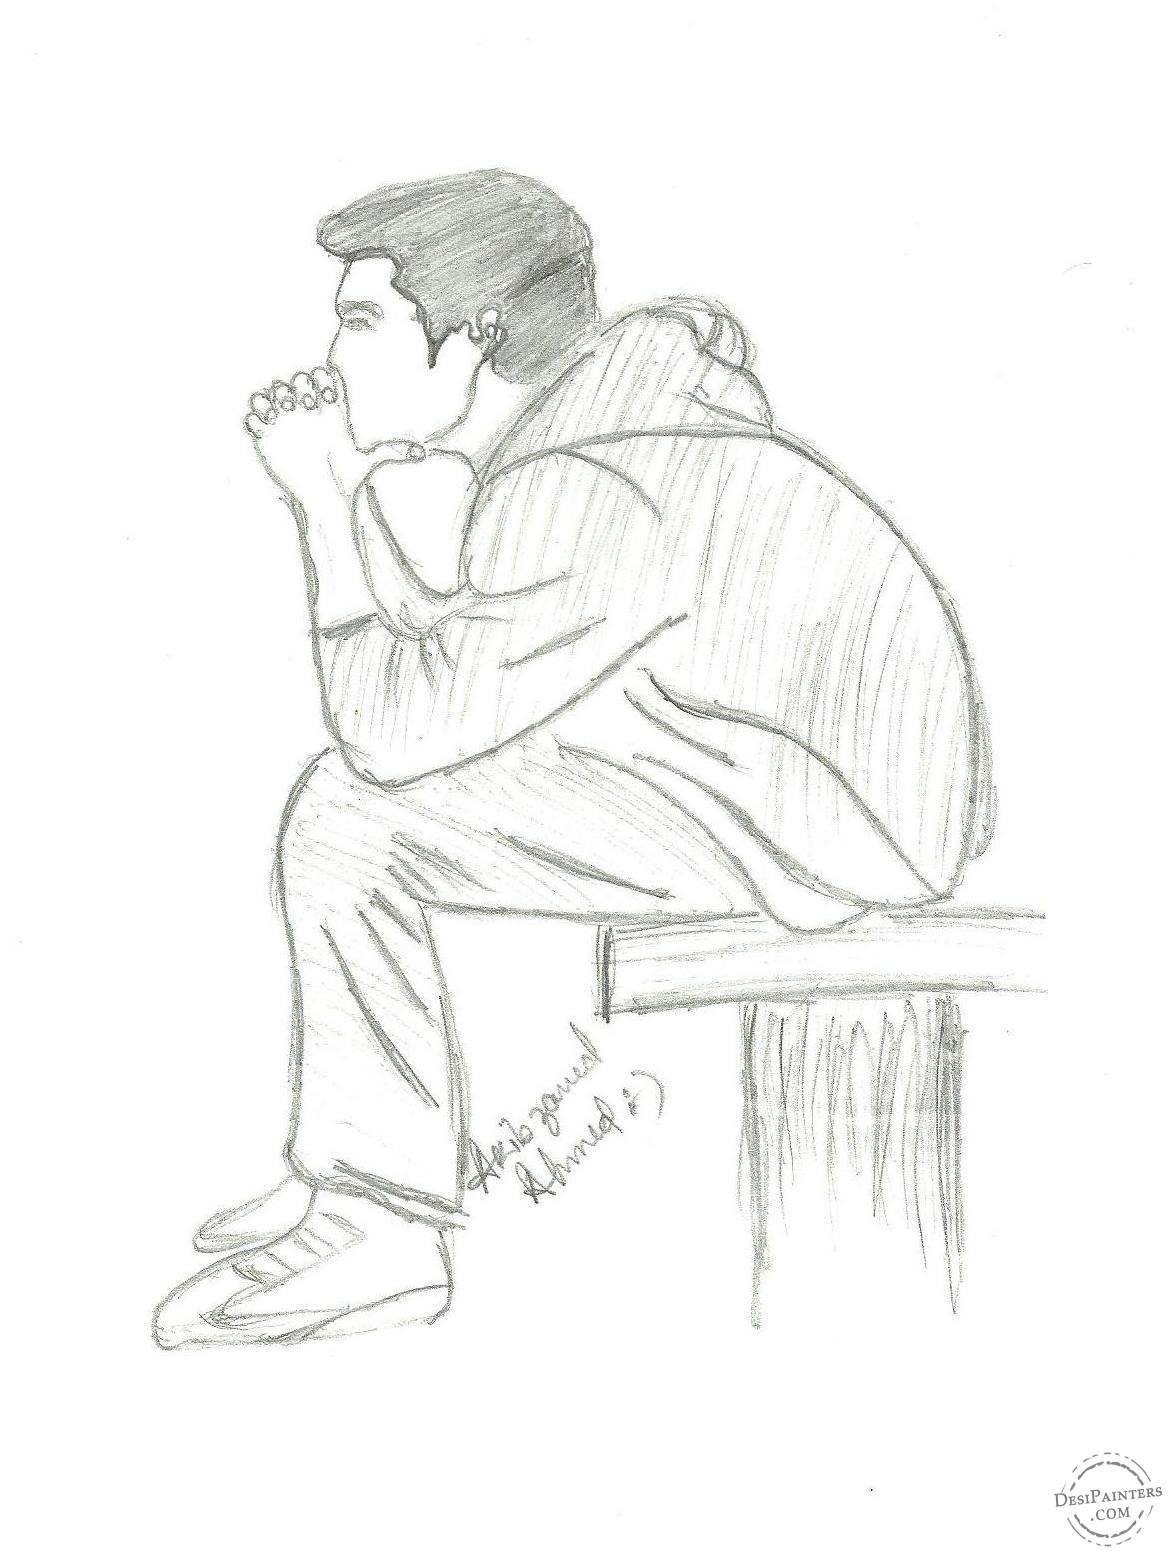 1168x1553 Sad Boy Drawing Pic Very Sad Boy Hd Image Pencil Sad Drawing